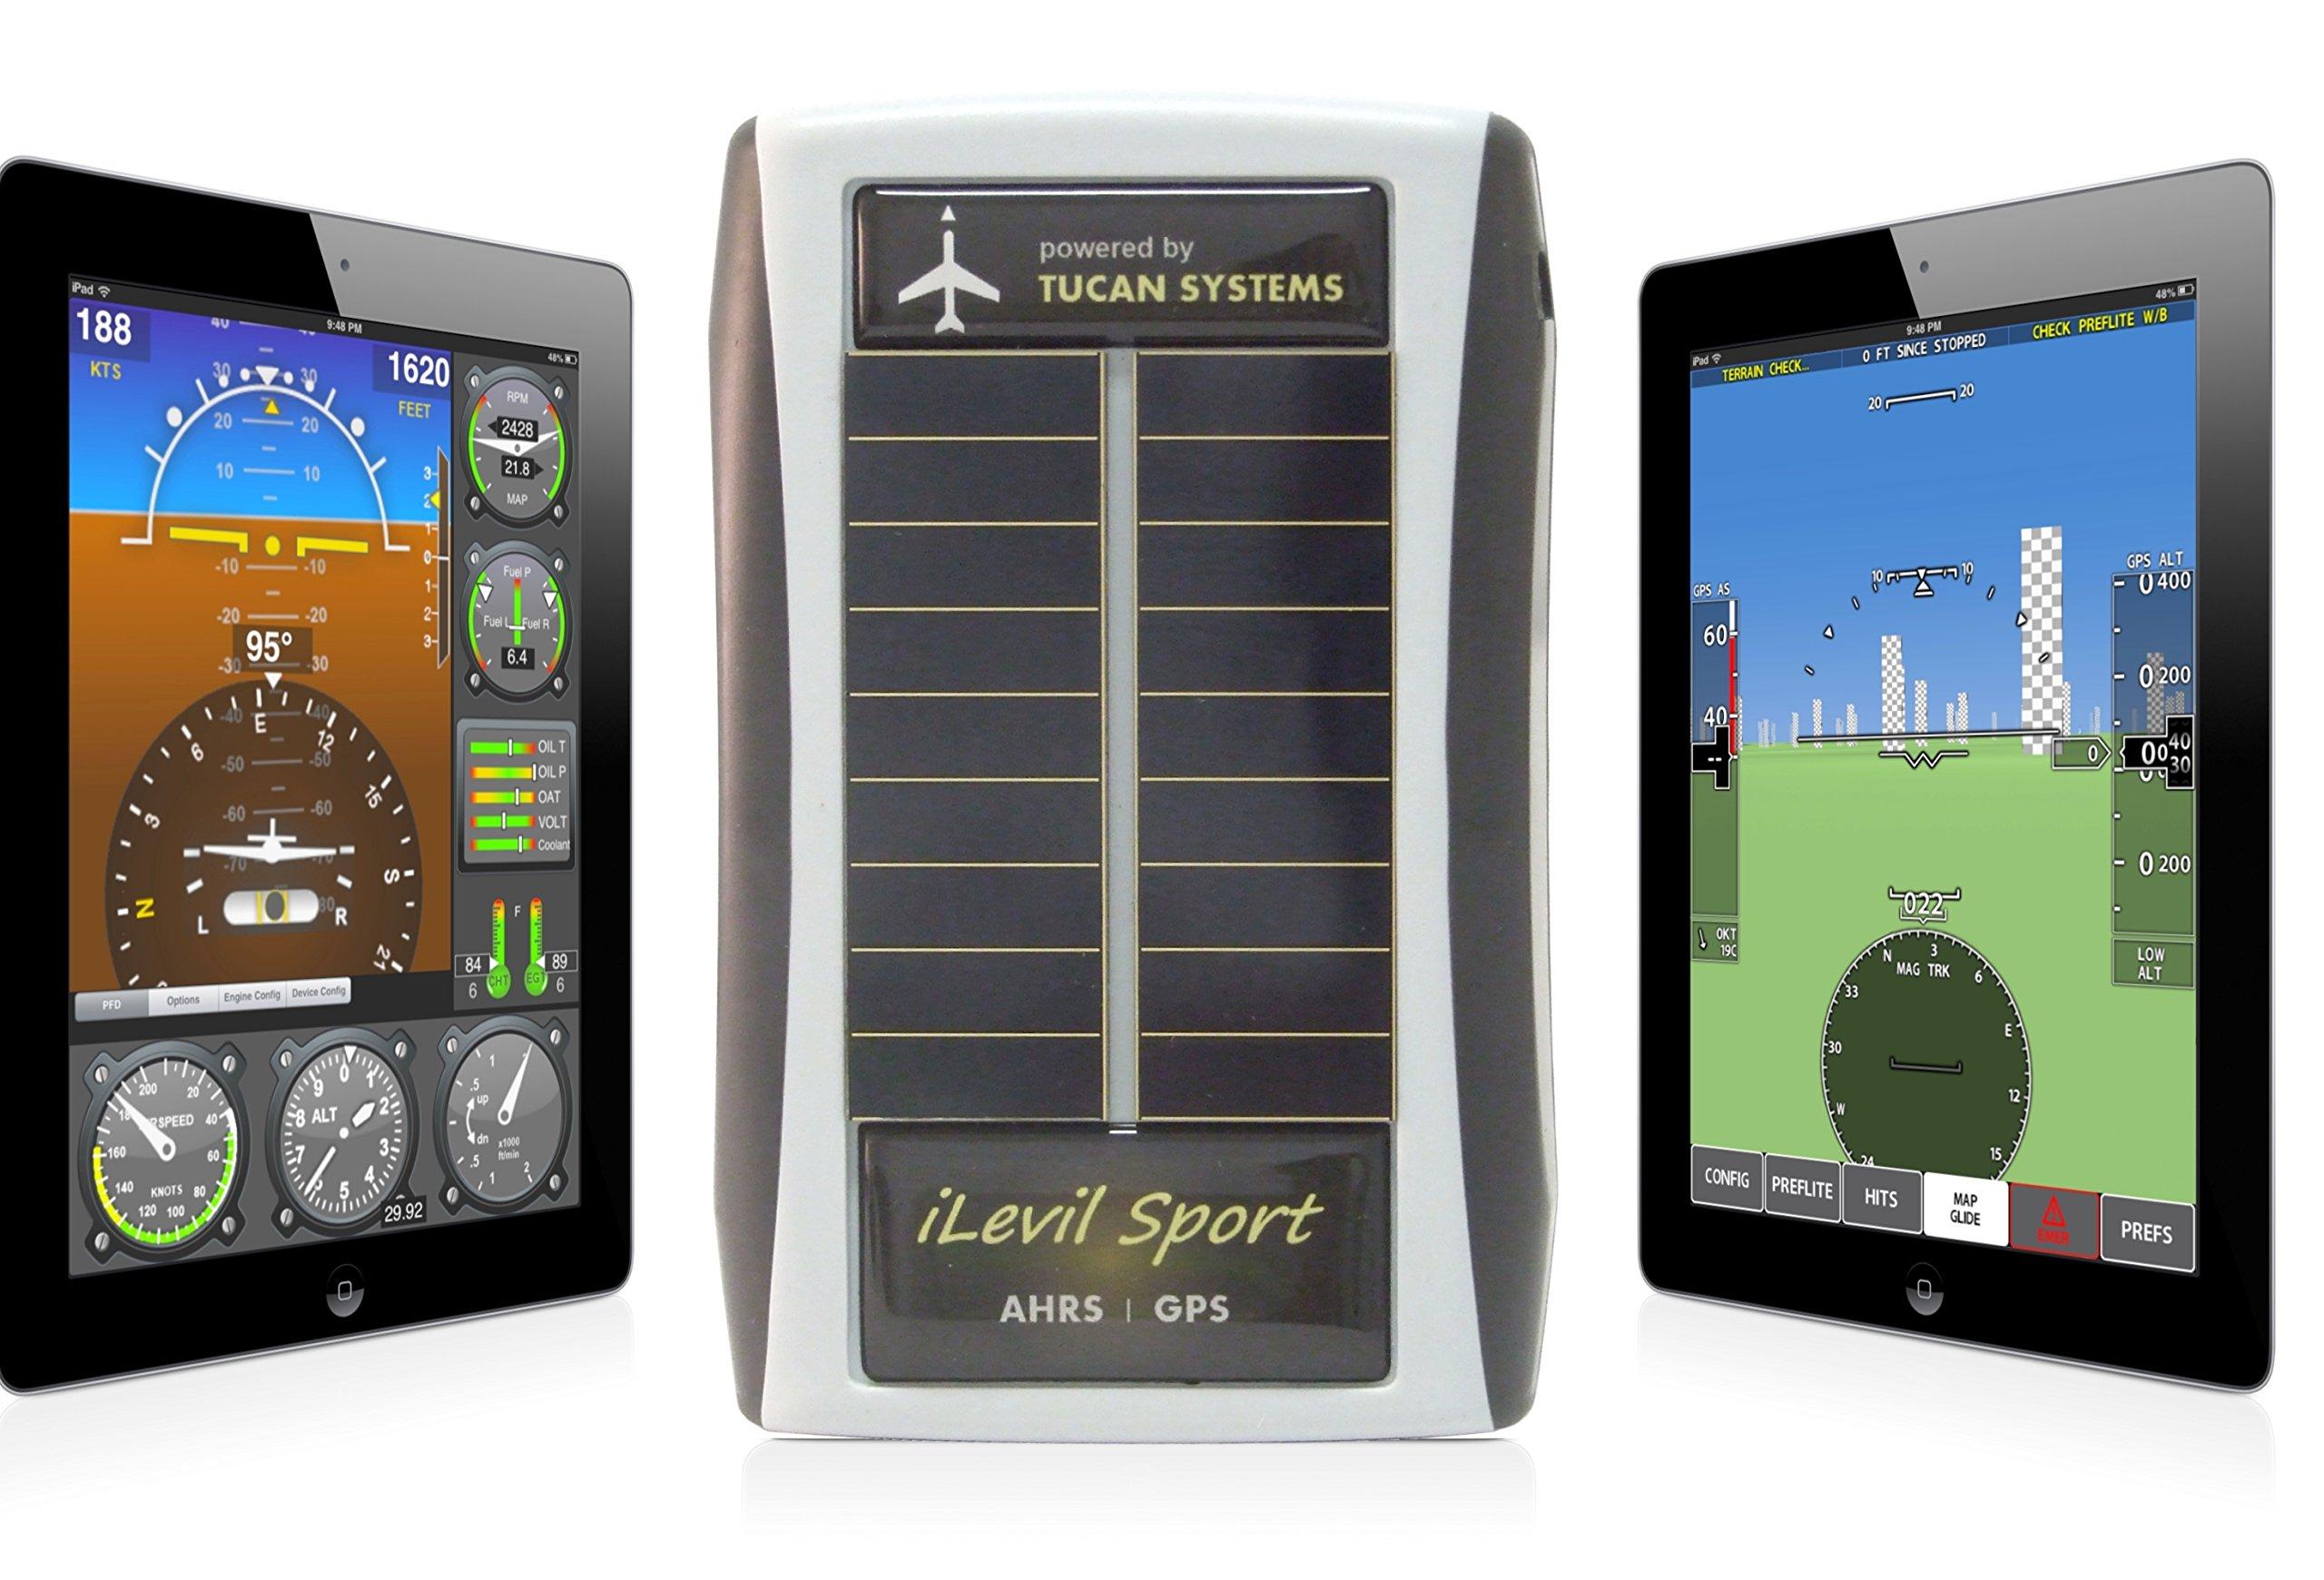 iLEVIL SPORT Portable AHRS/GPS